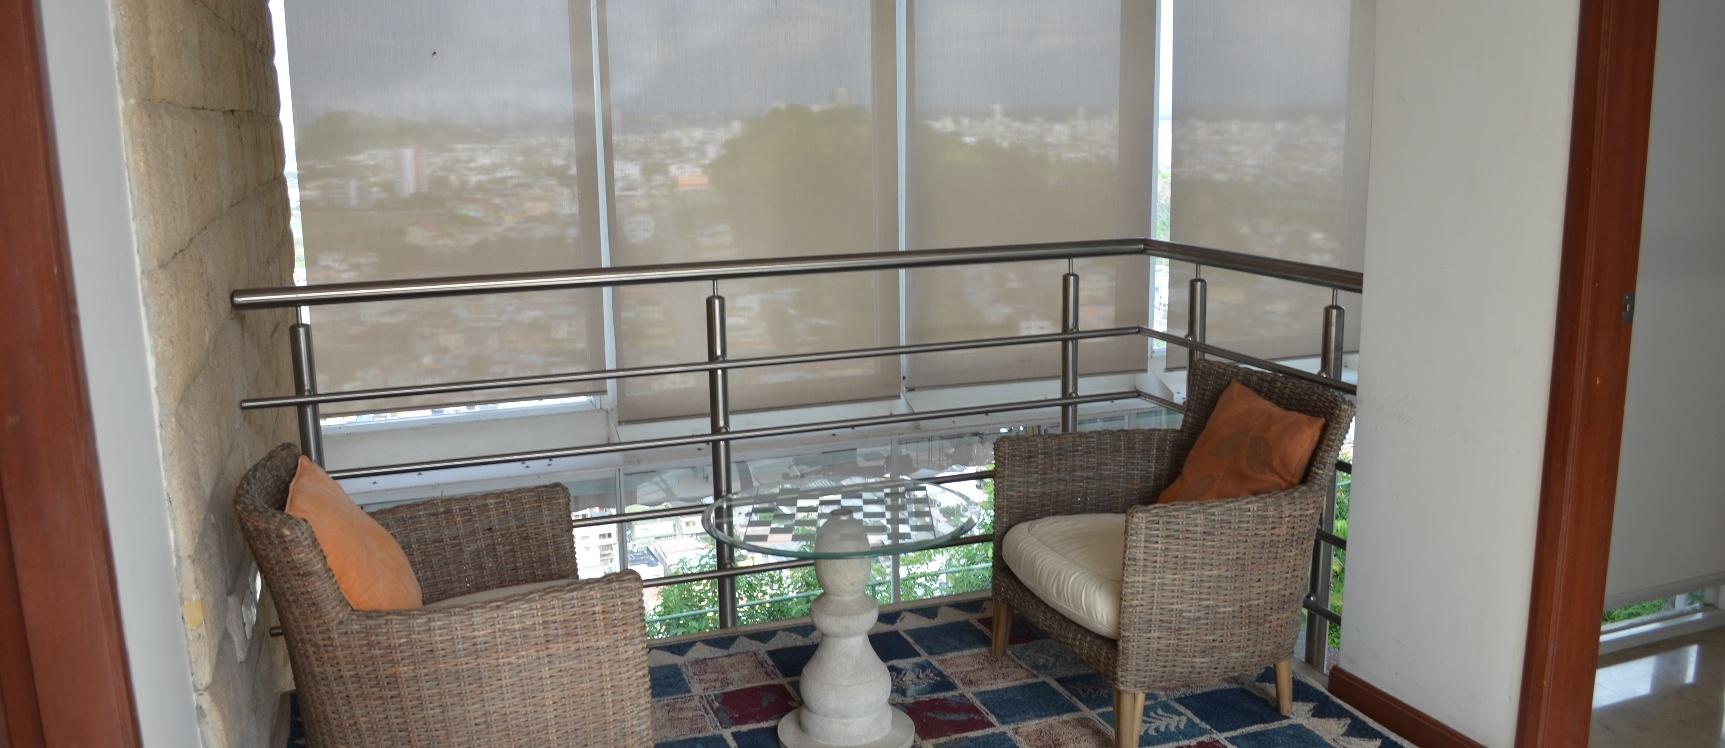 Casa en venta en urbanizaci n bellavista sector centro sur for Alquiler de casas en bellavista sevilla